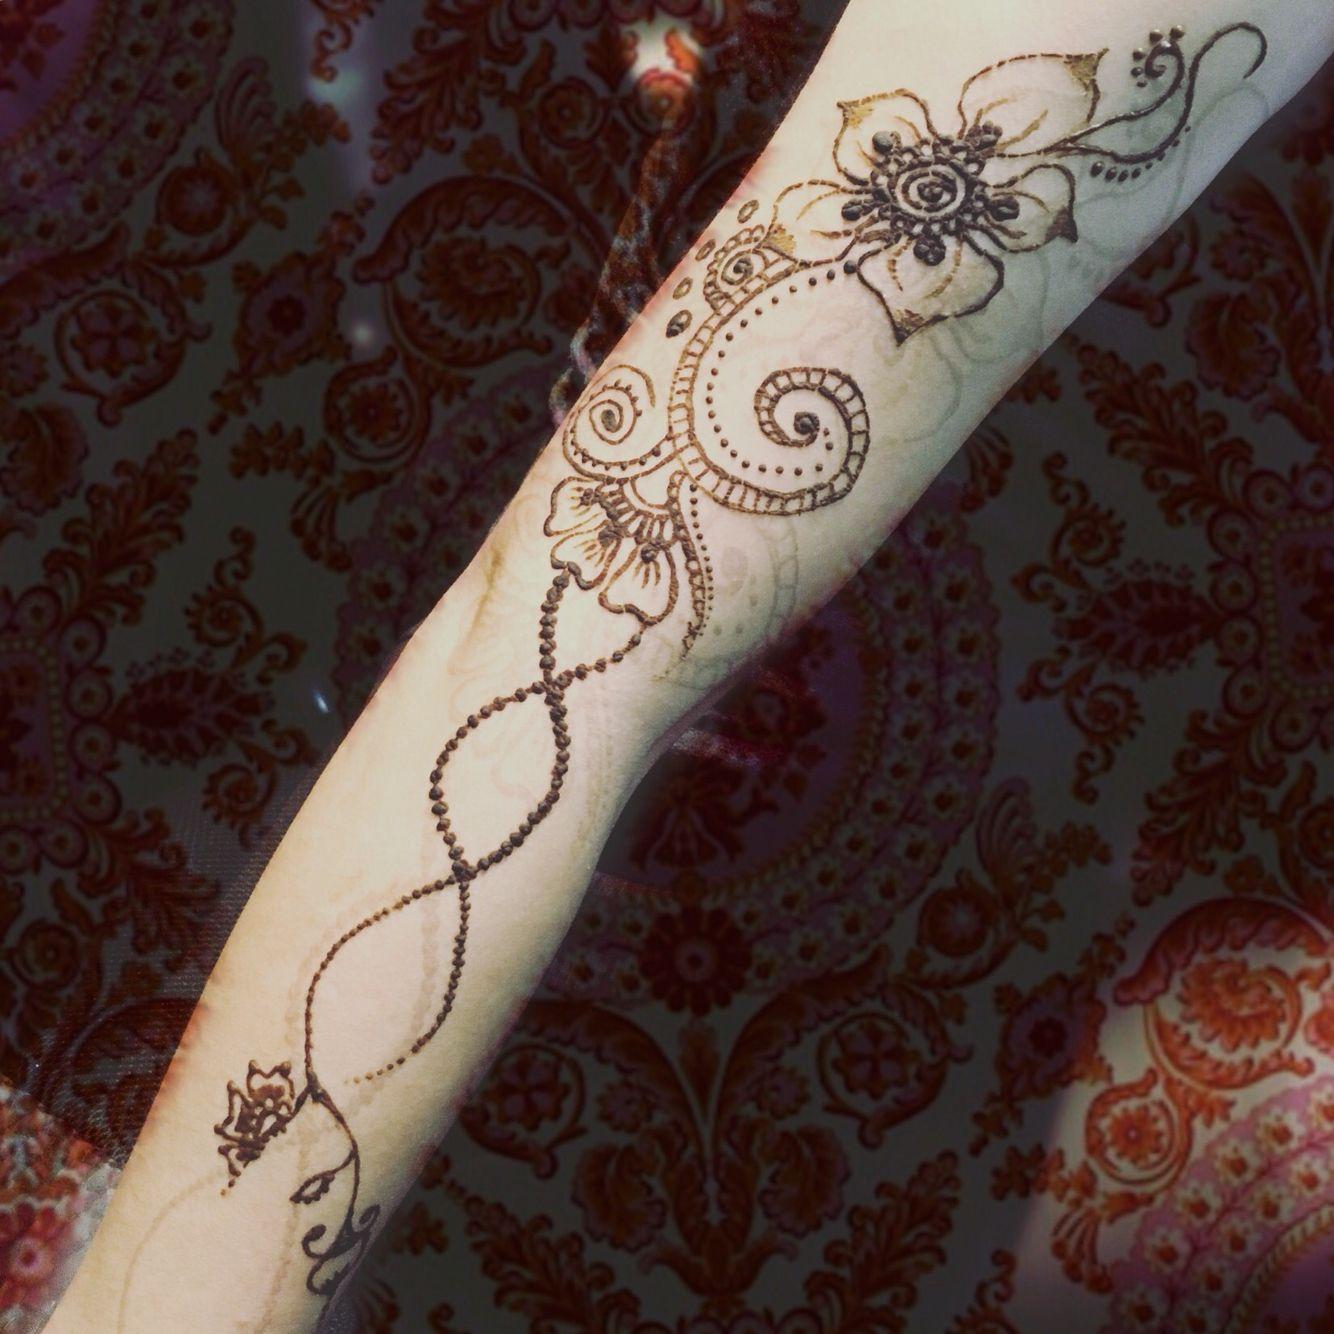 Pin by mandy on Henna Mehndi | Hand tattoos, Hand henna ...